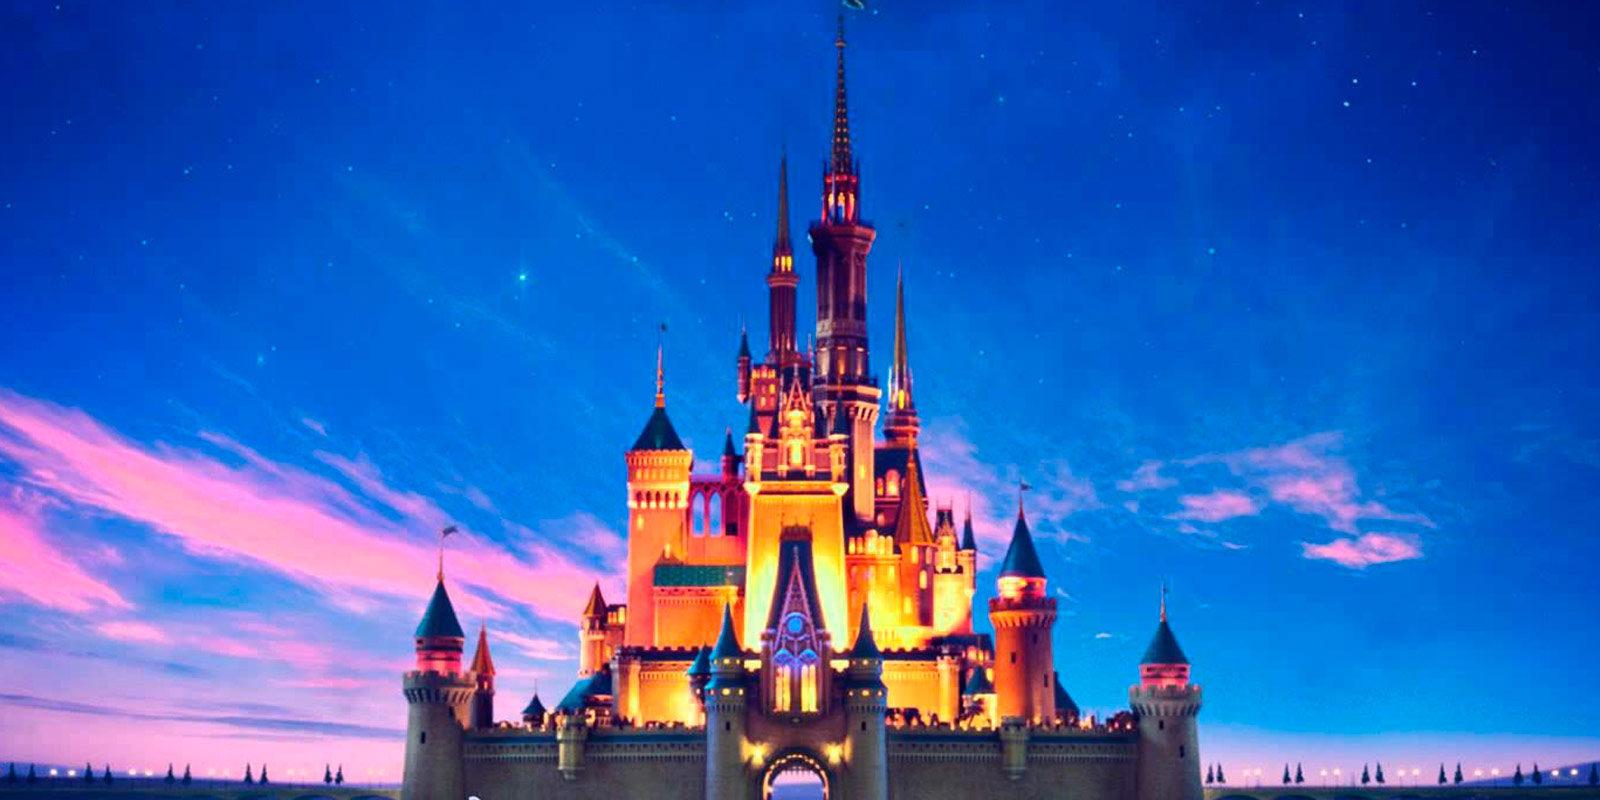 Welcome To Wdwnewscom! Home Of Everything Walt Disney - 1280×720